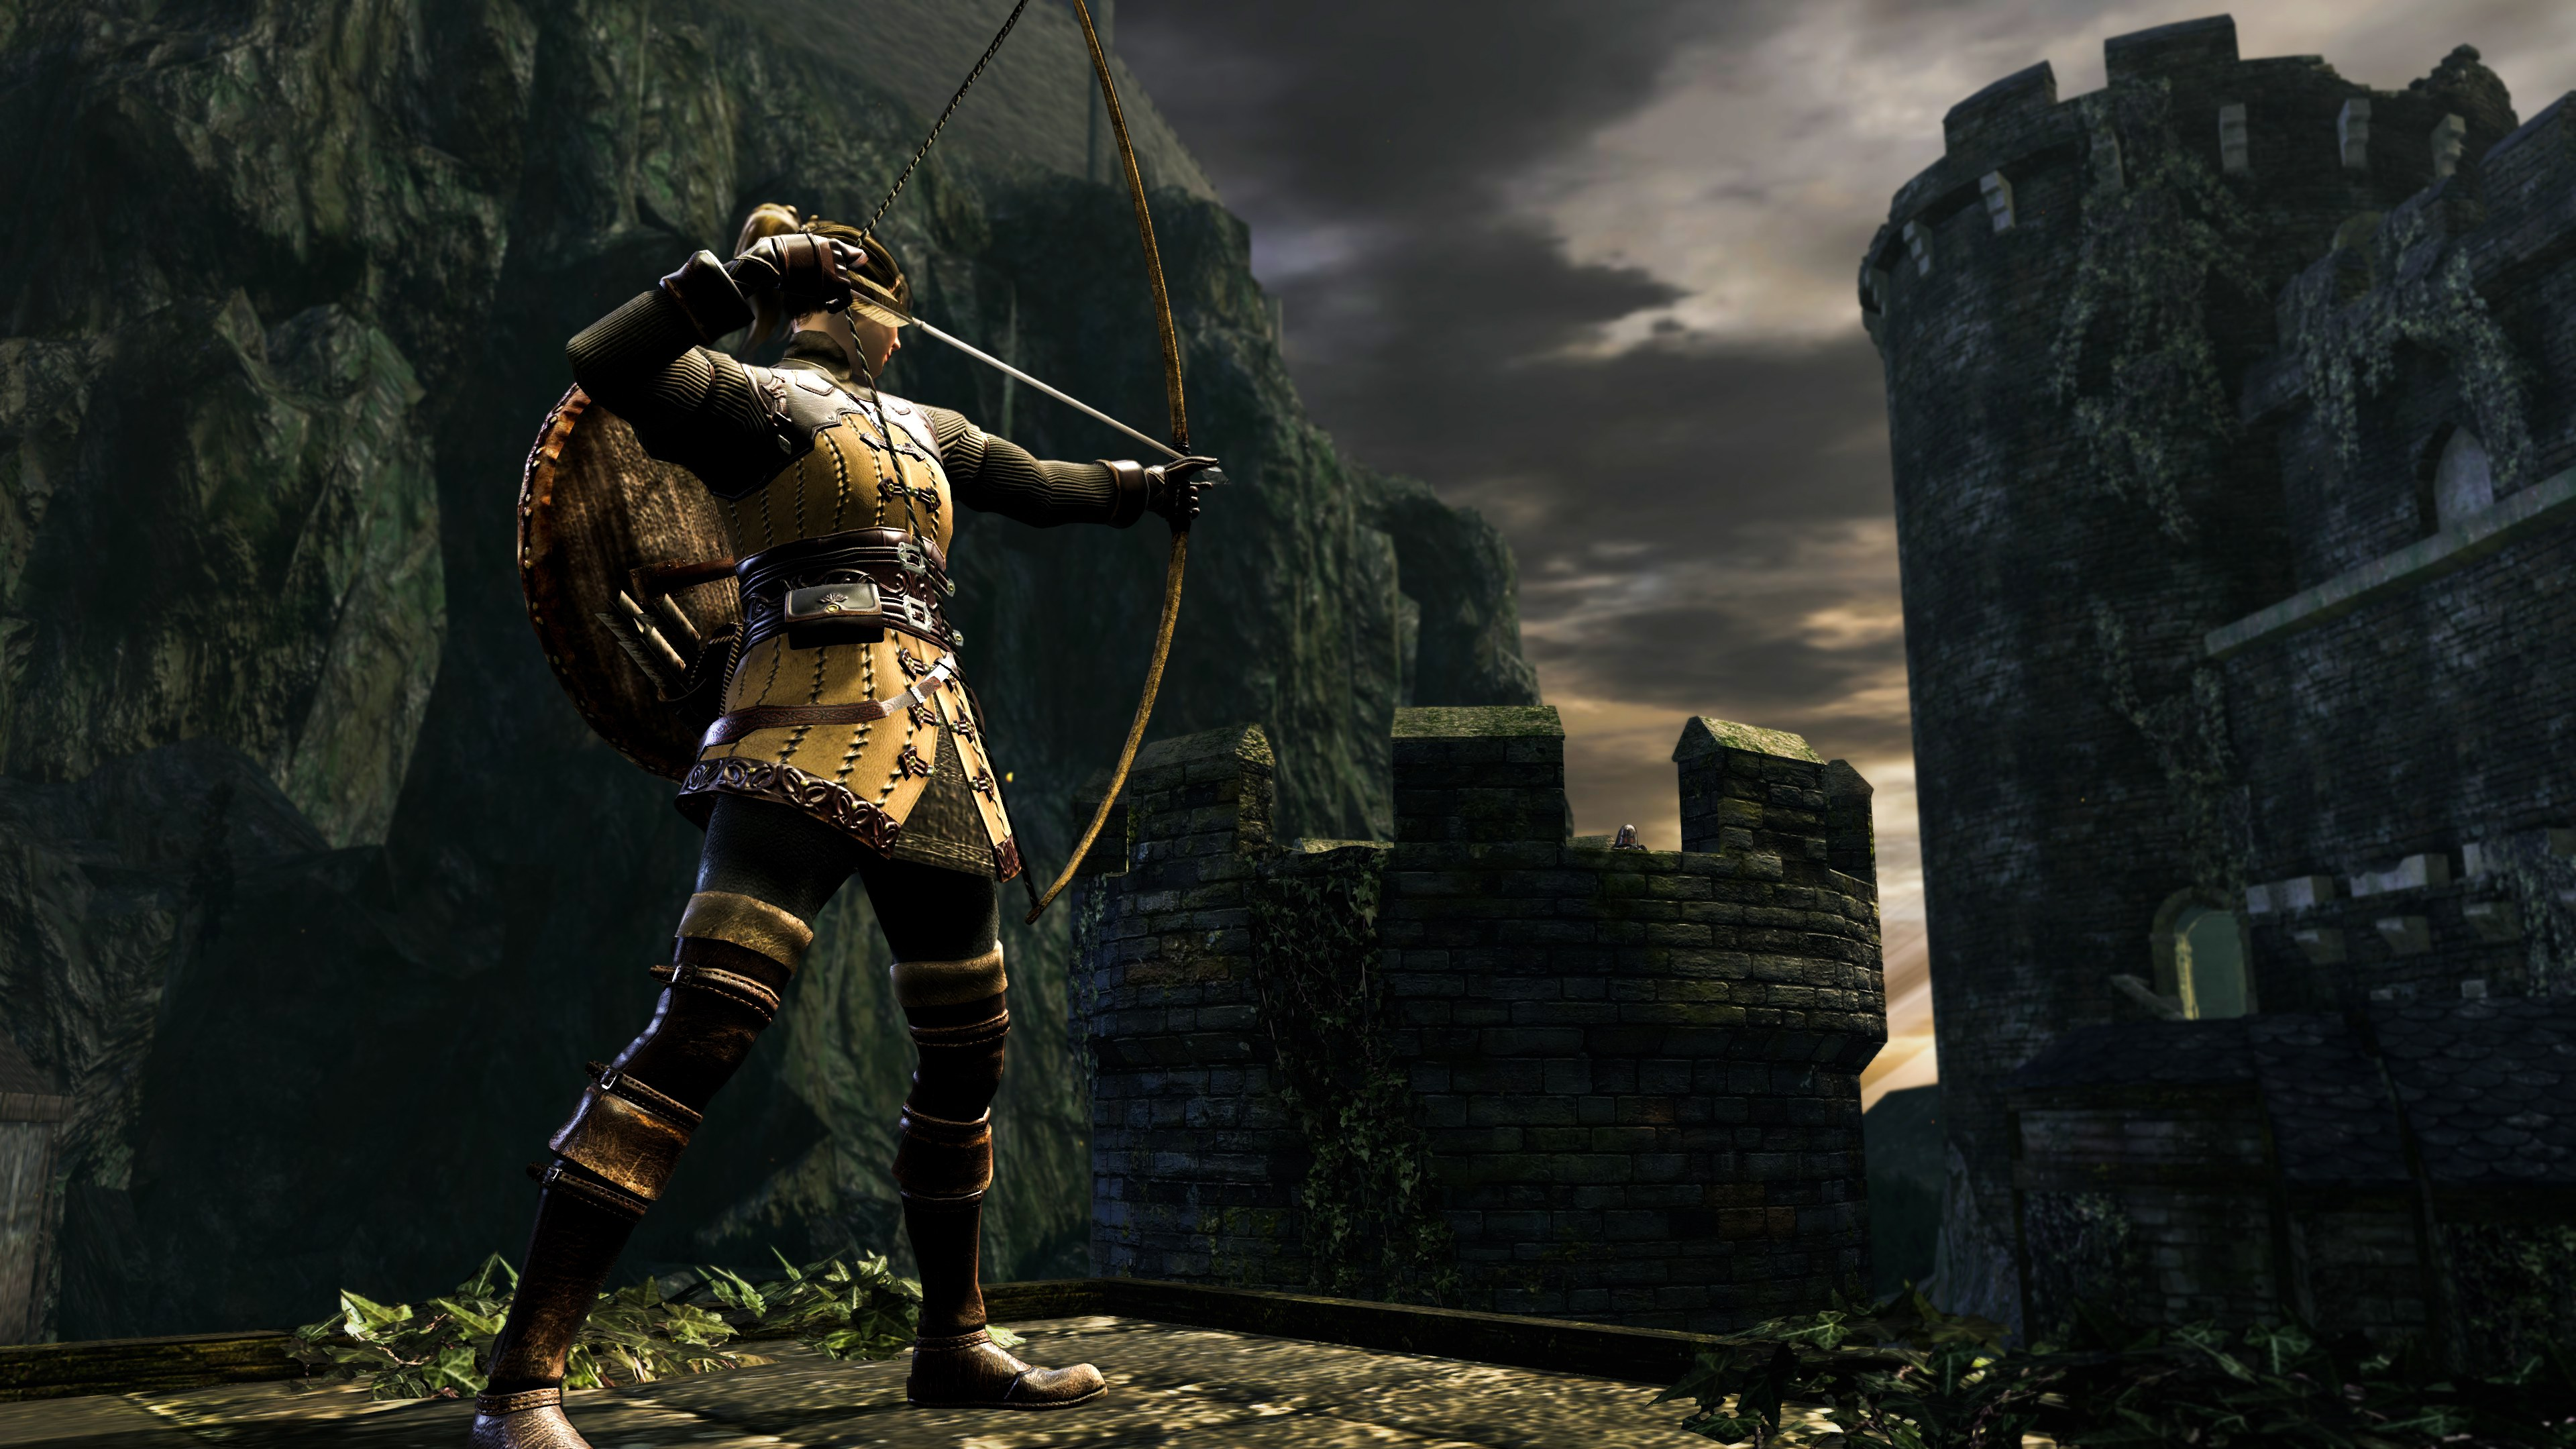 Dark Souls Remastered Hd Games 4k Wallpapers Images